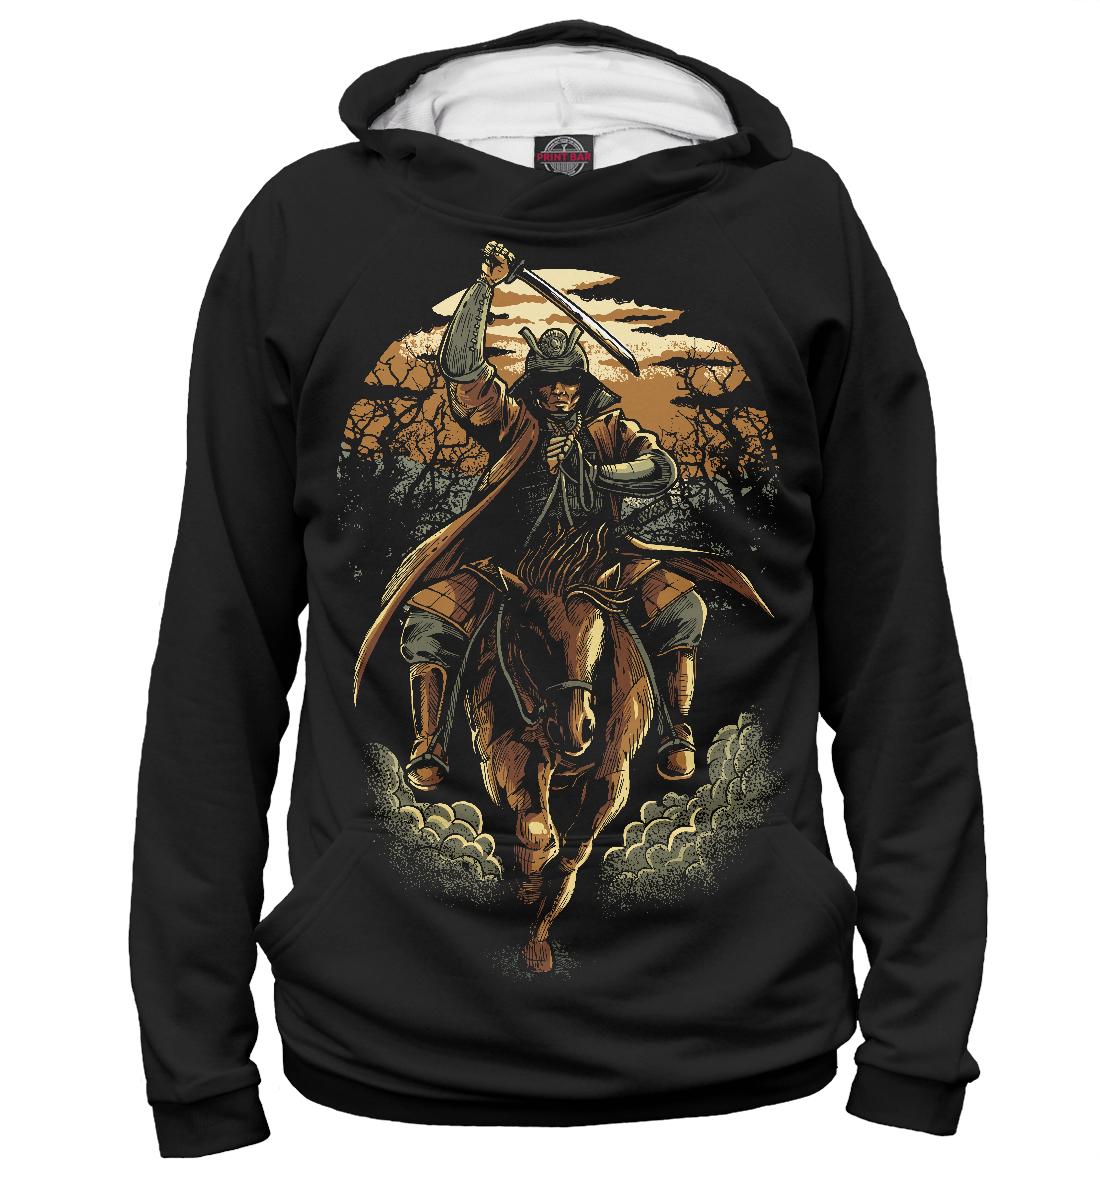 Самурай на коне федоров м ю два всадника на одном коне